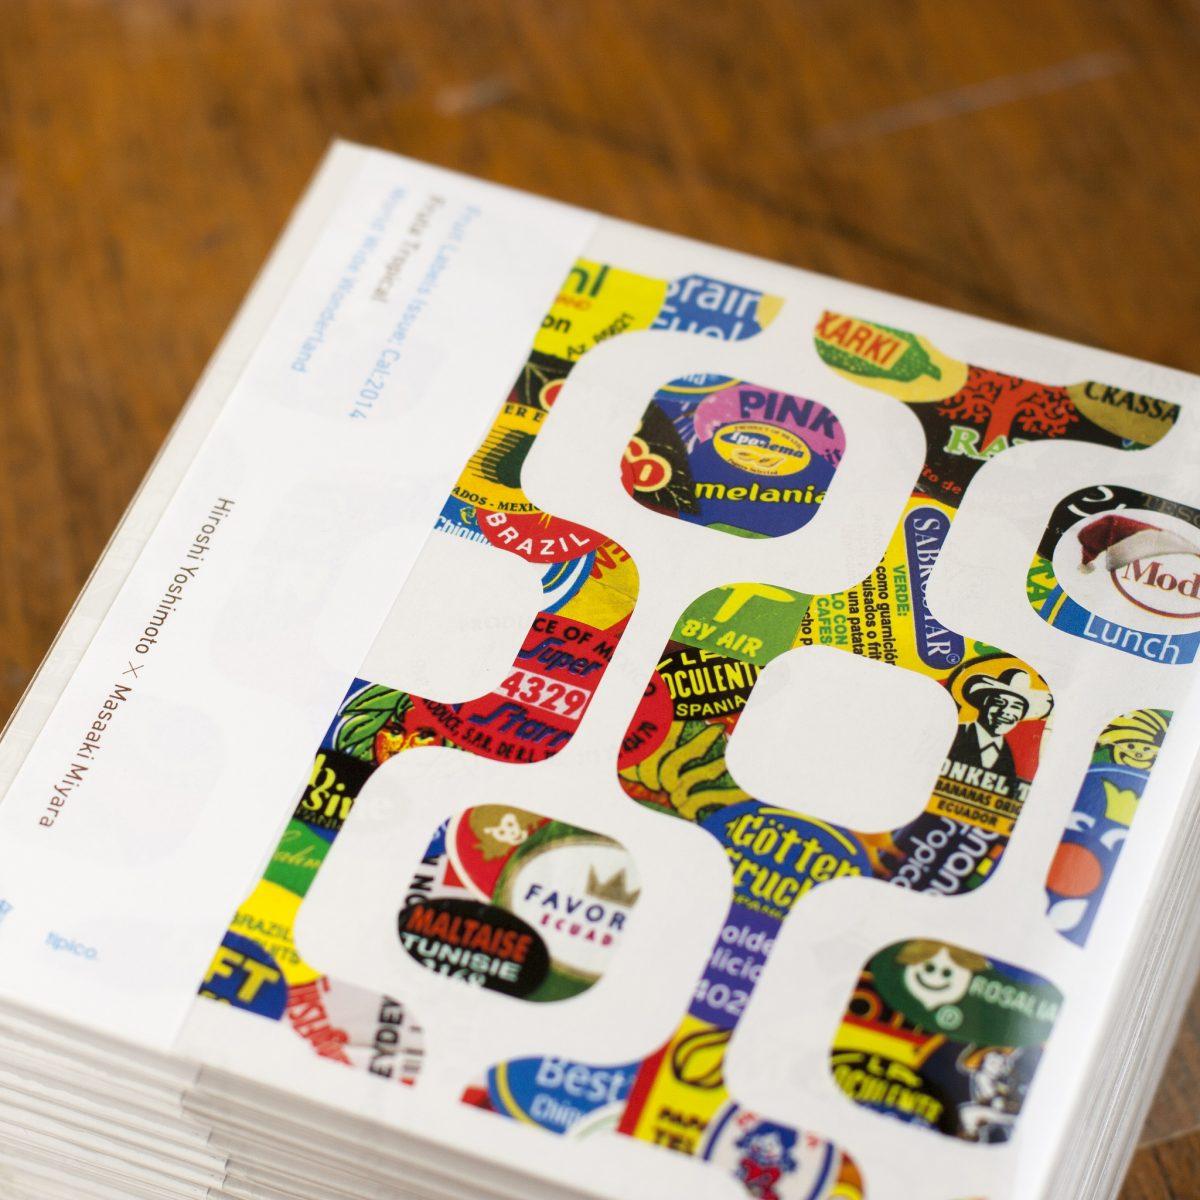 FRUTA TROPICAL World Wide Wonderland, Fruit Labels Issue; Cal:2014 グラフィックデザイン